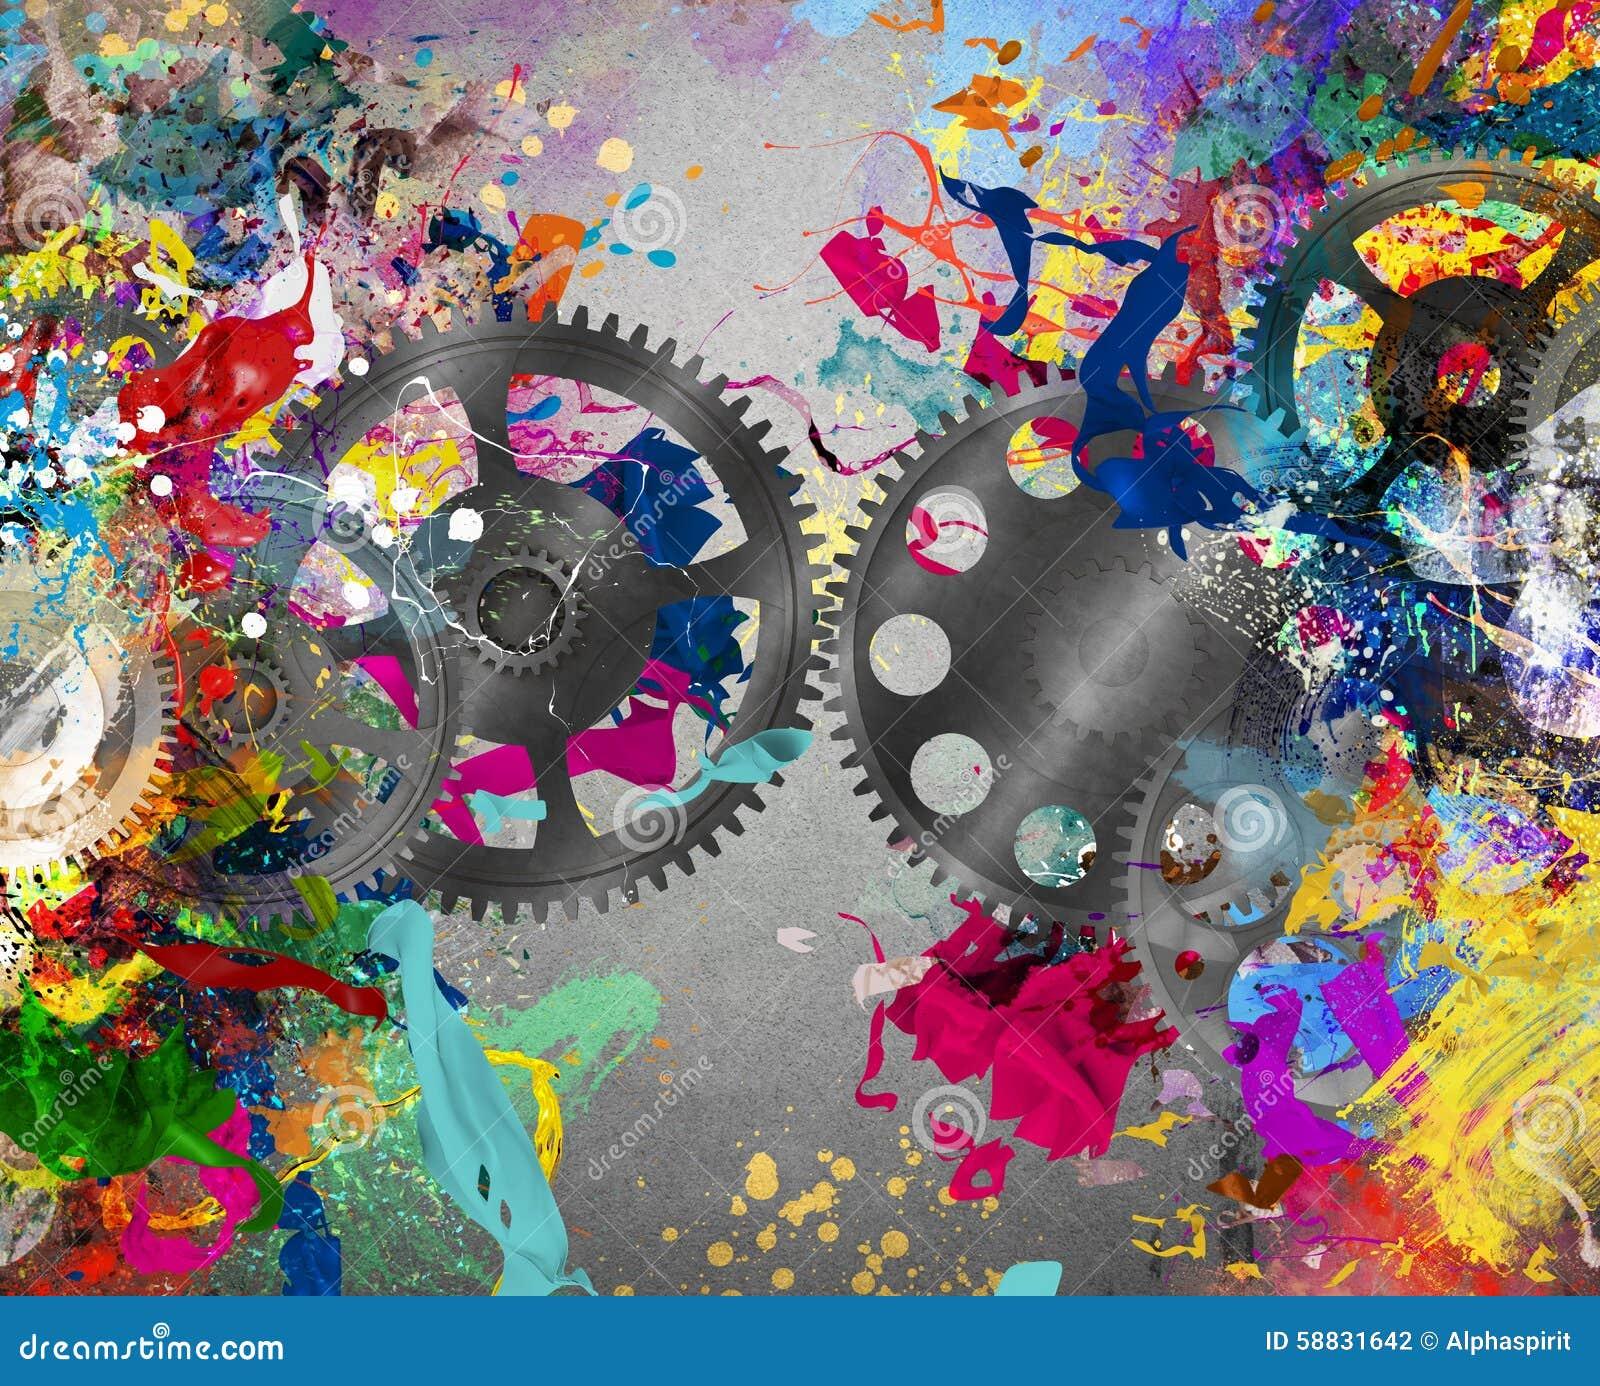 Creative Gear Stock Photo - Image: 58831642